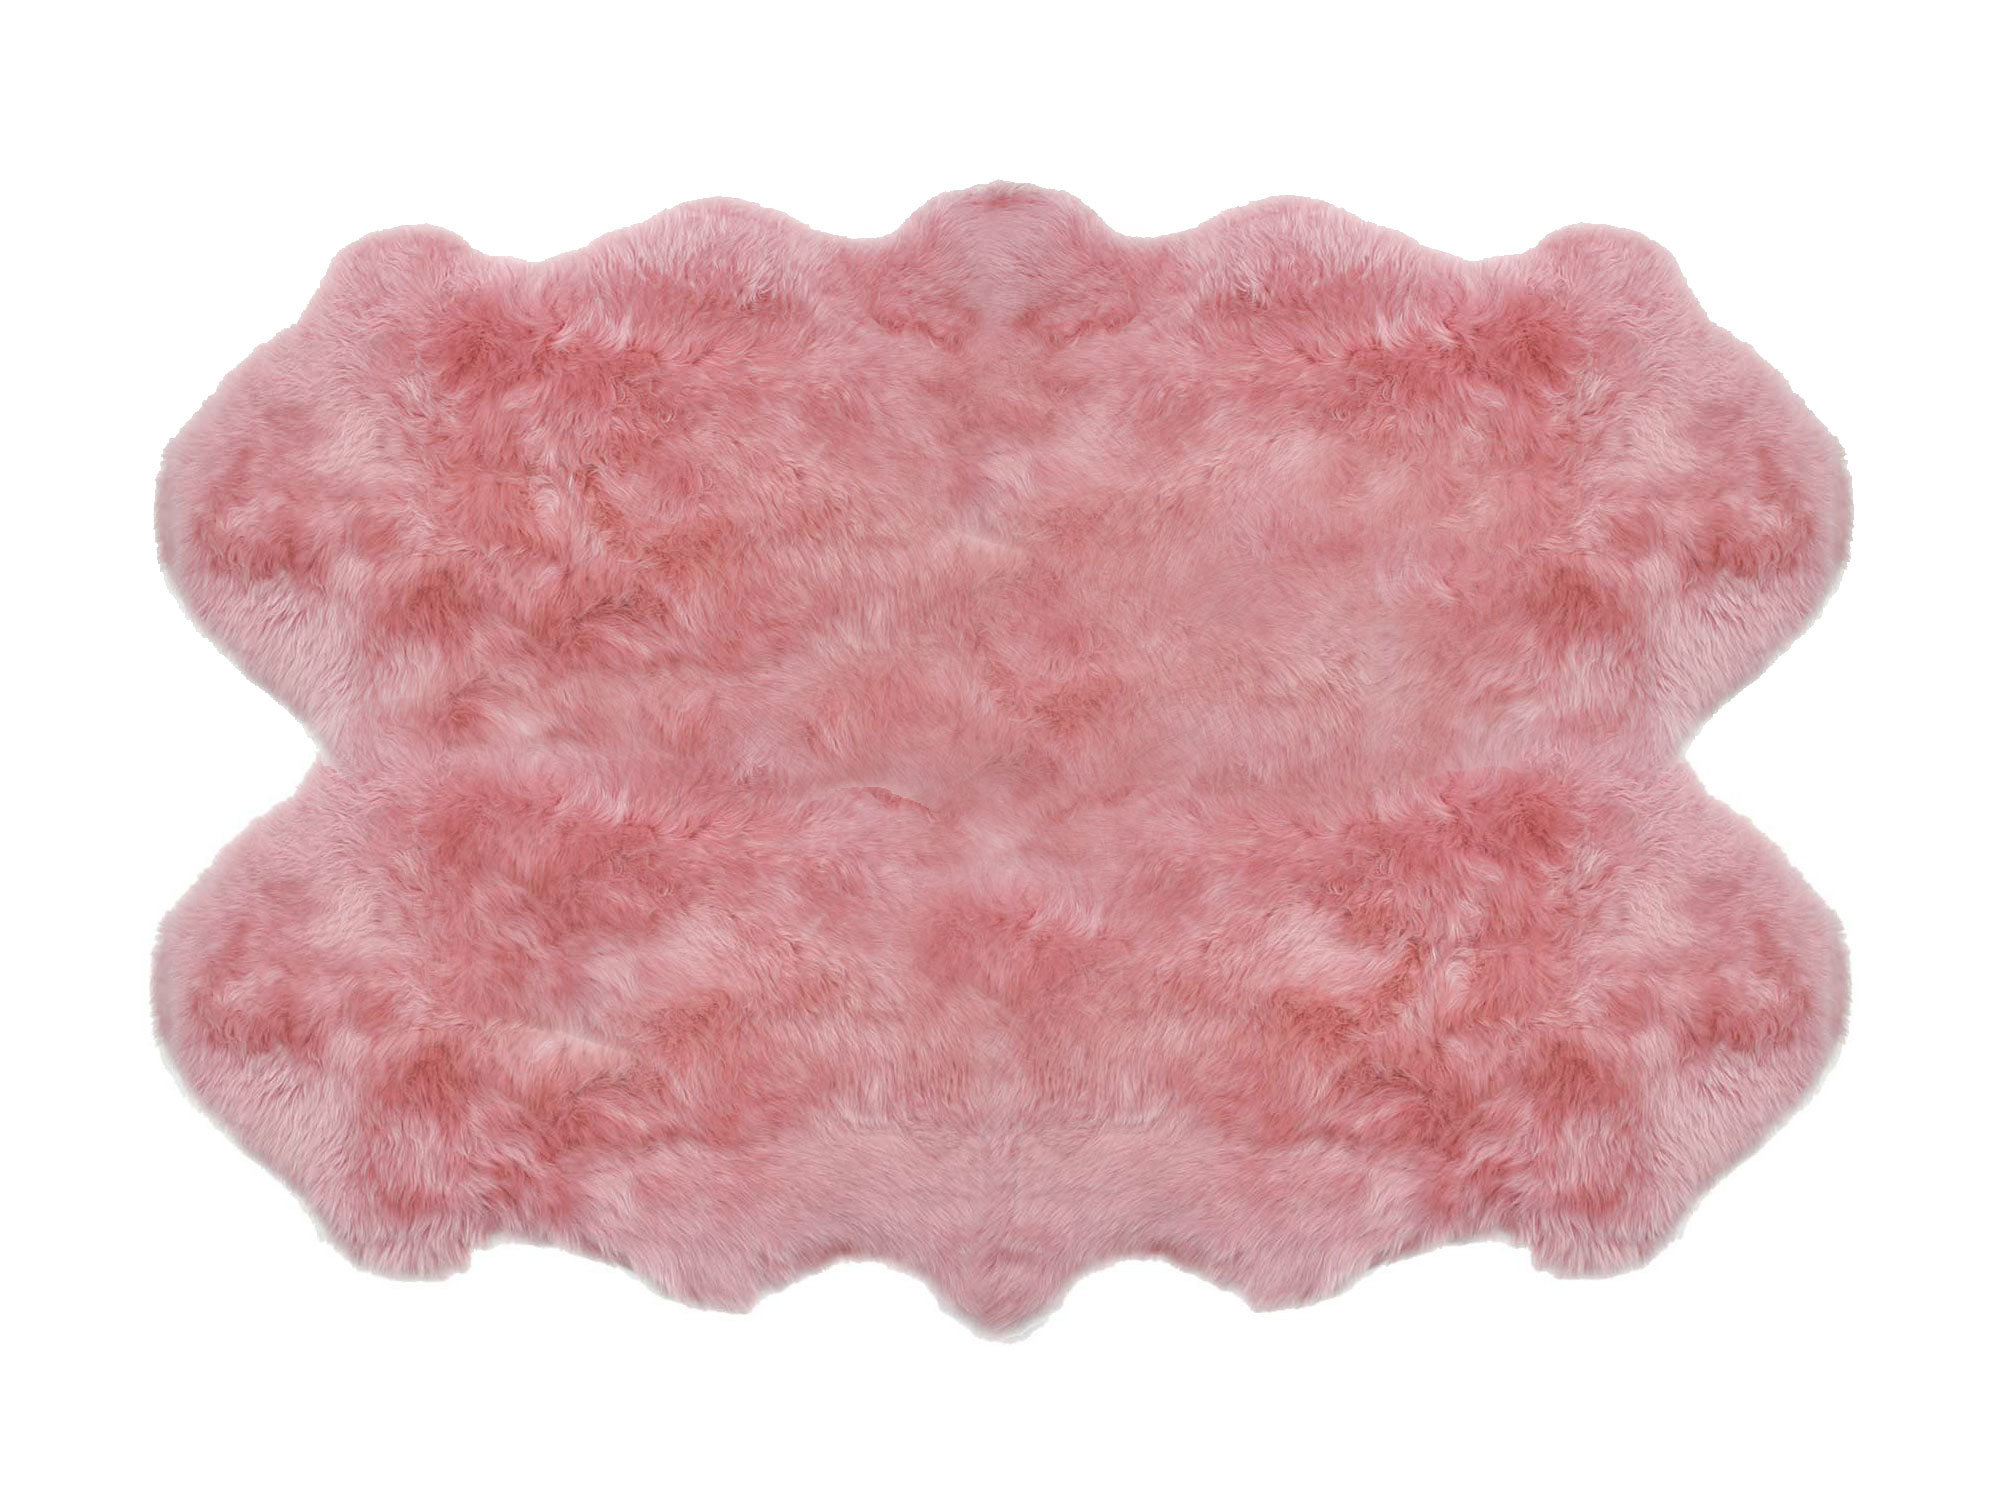 Baby Seat For Golf Cart >> FIBRE by AUSKIN Sheepskin Rugs 4 Pelt Premium Dark Rose Pink – Ultimate Sheepskin